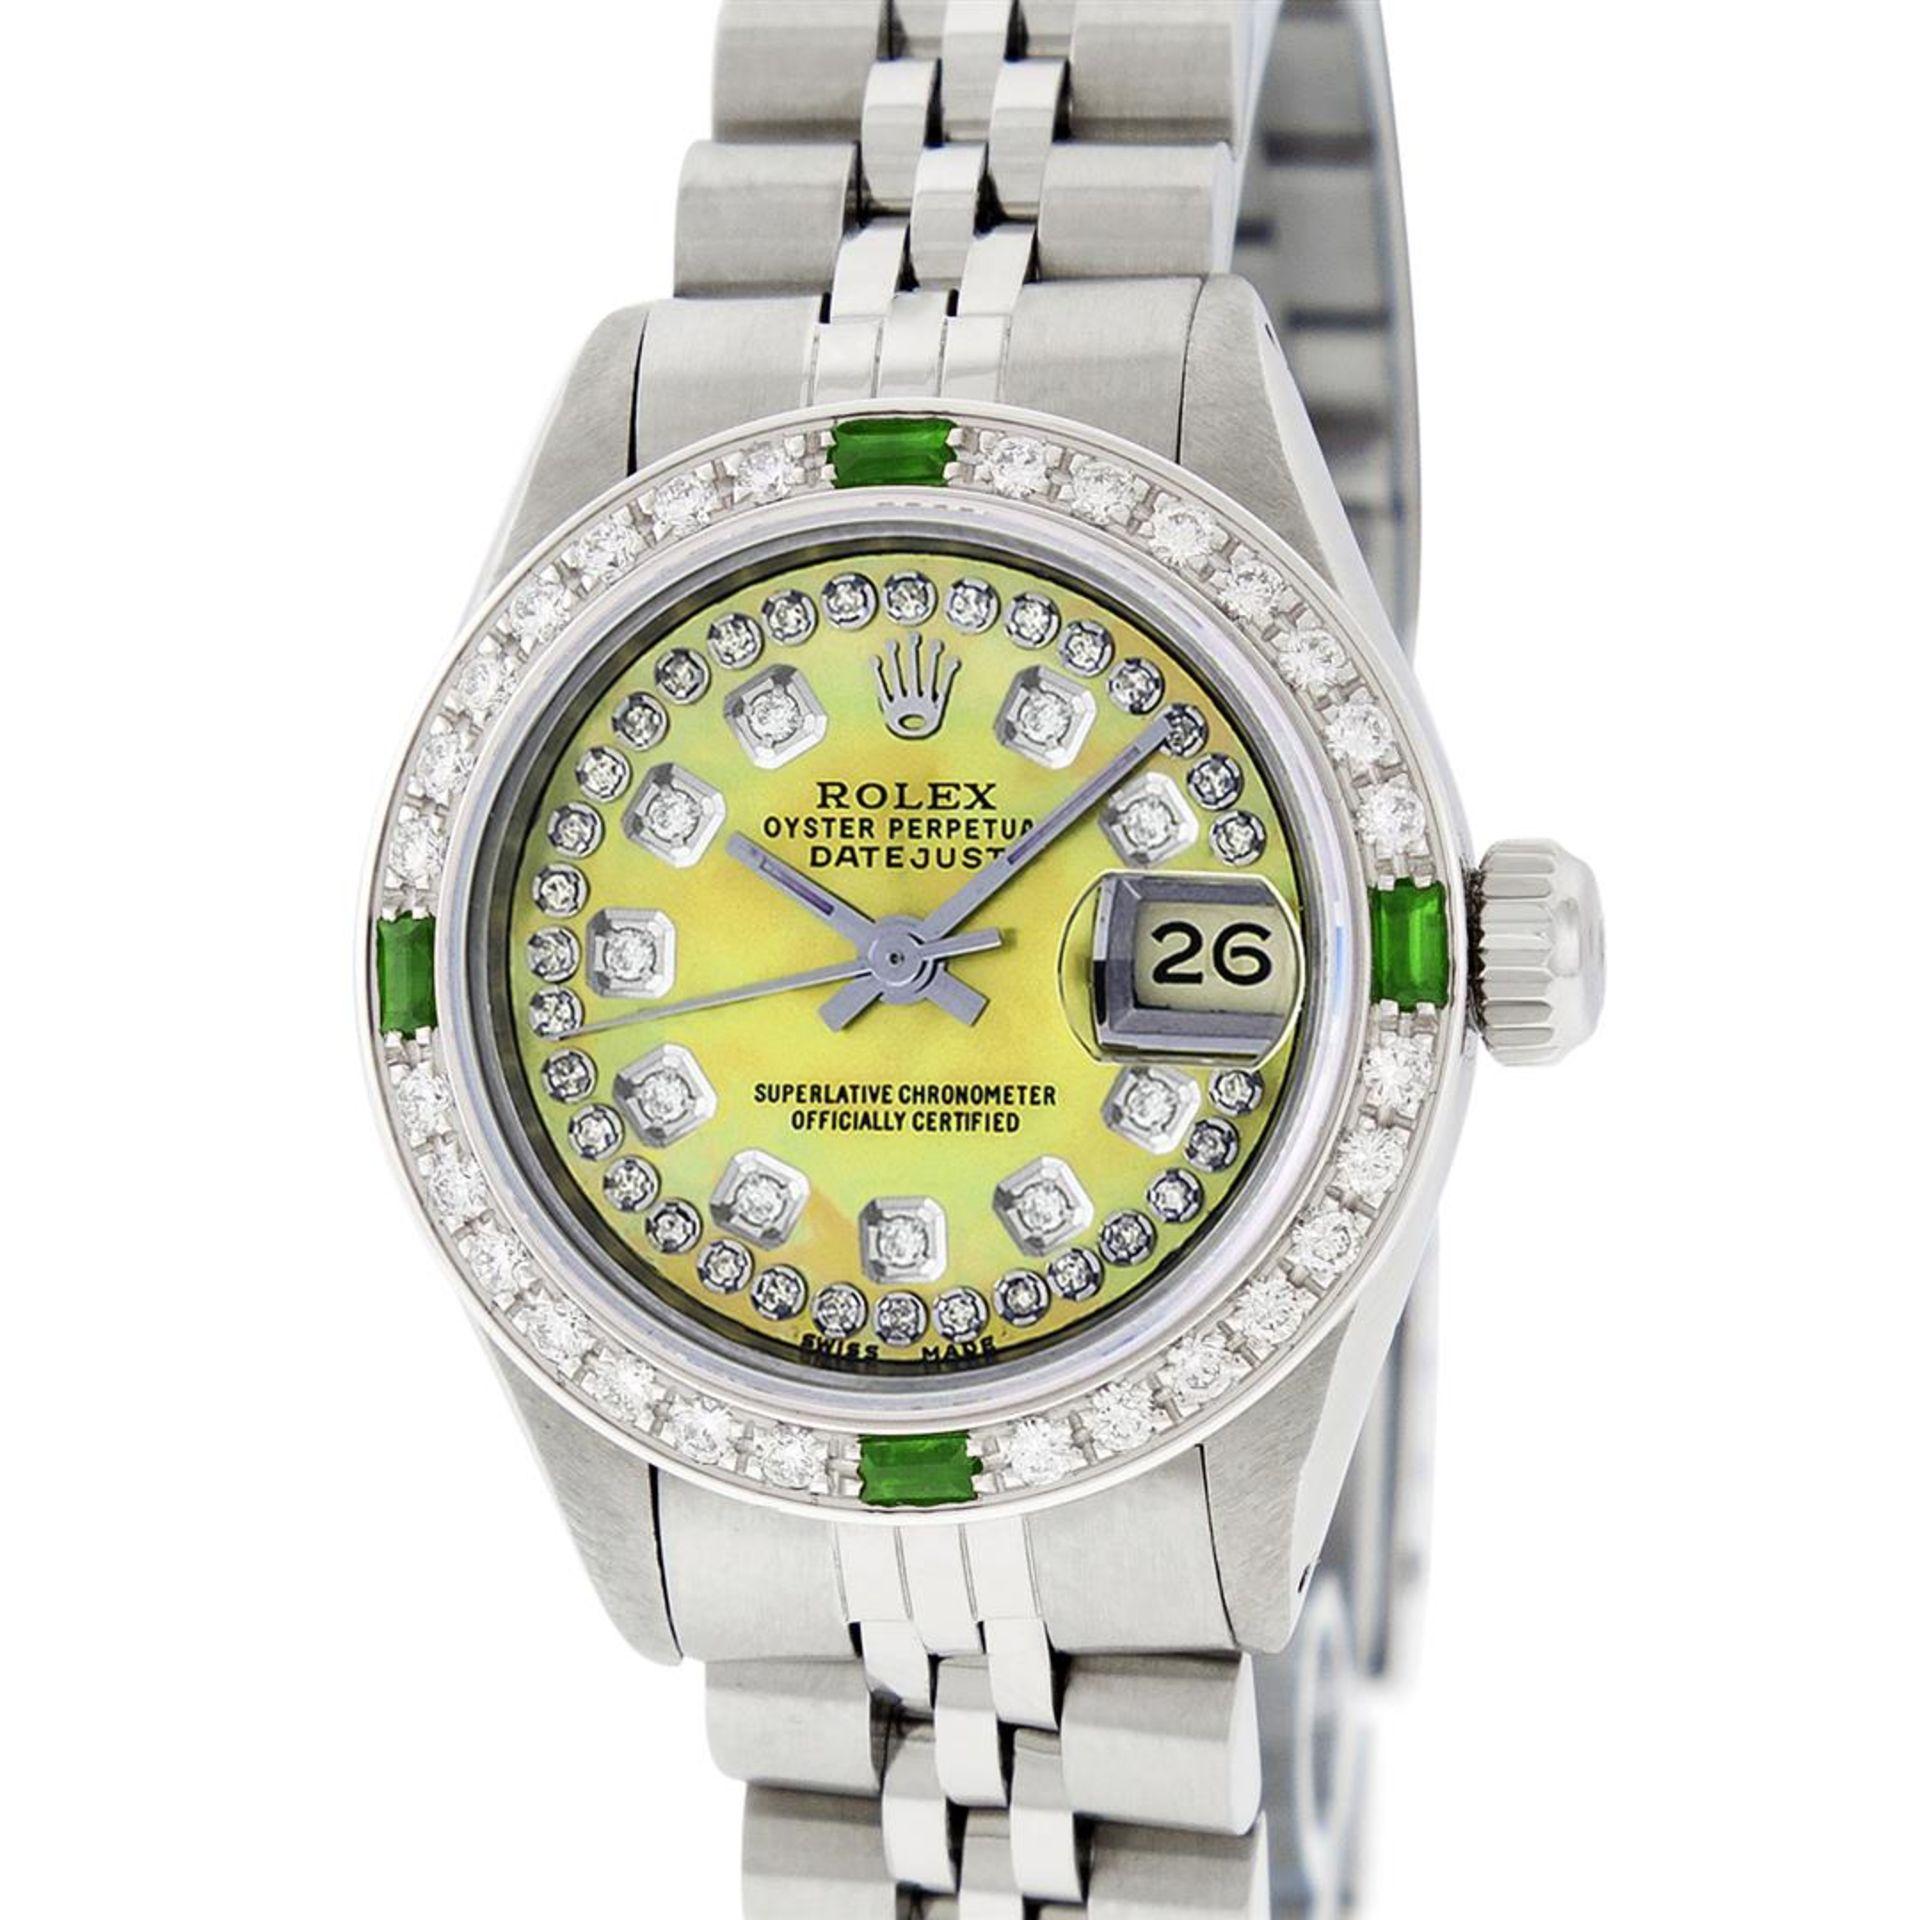 Rolex Ladies Stainless Steel Yellow MOP Emerald & Diamond Datejust Wristwatch - Image 2 of 7